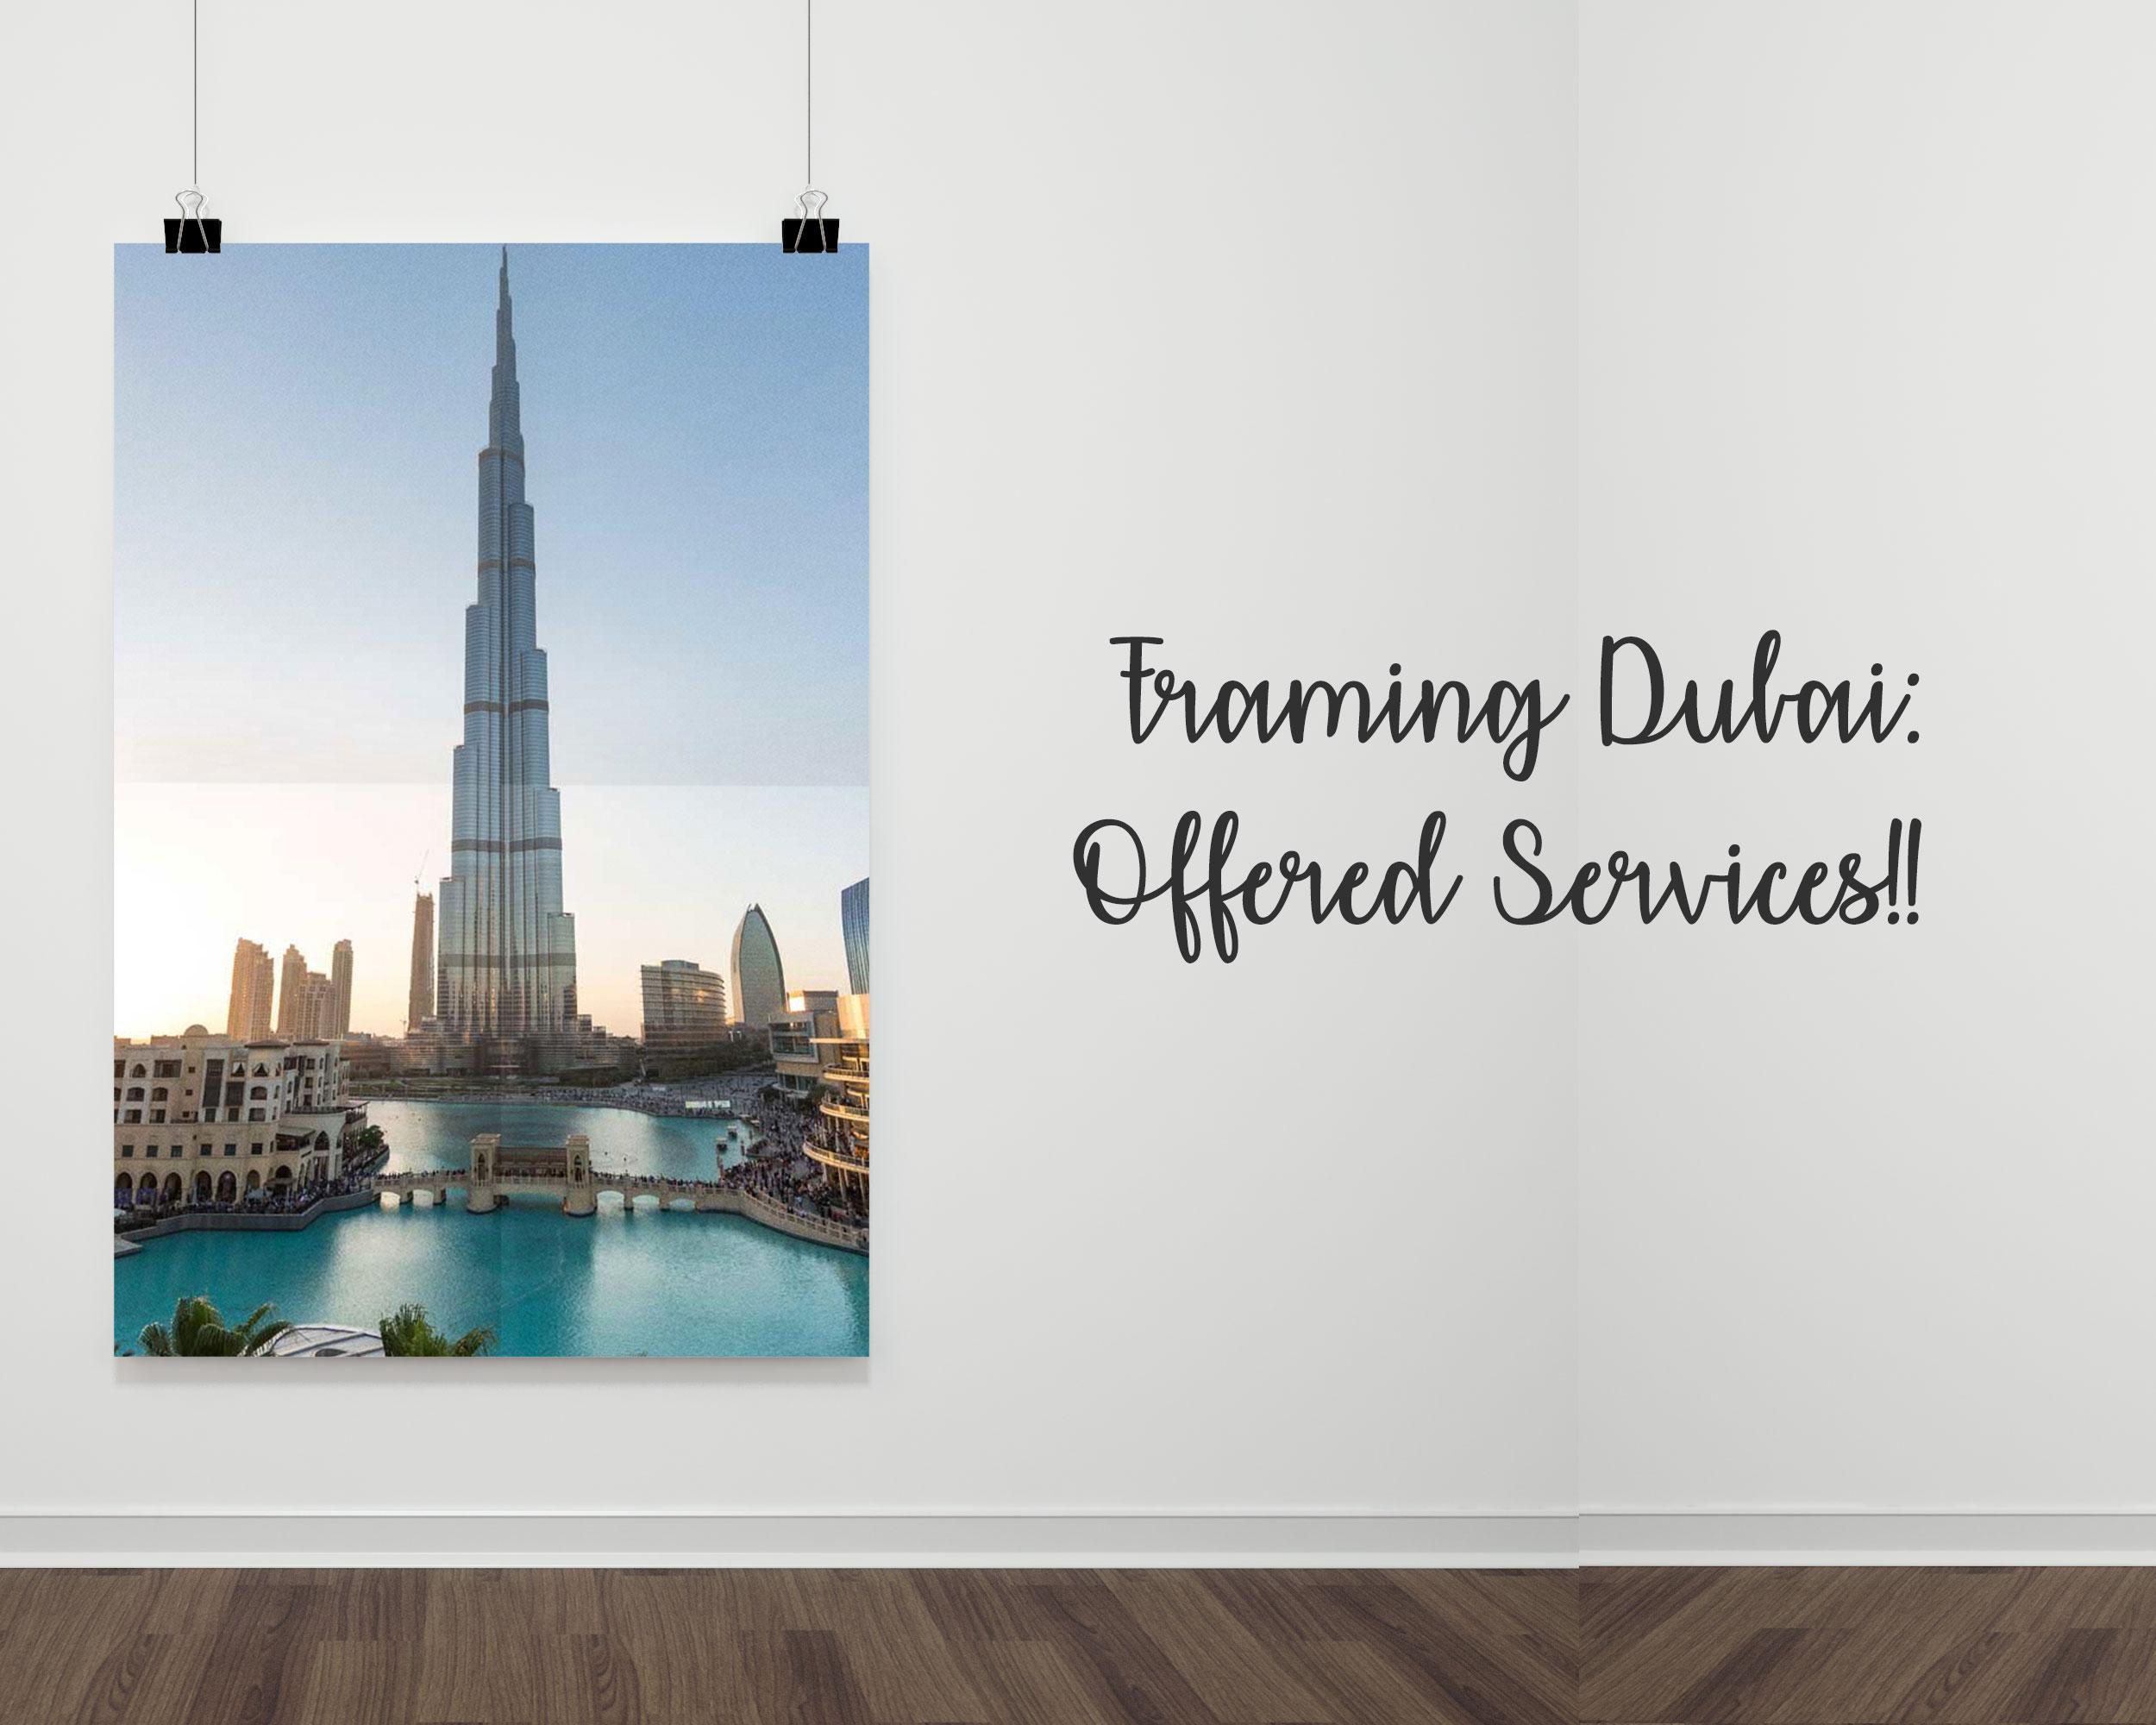 Framing Dubai: Offered Services!!